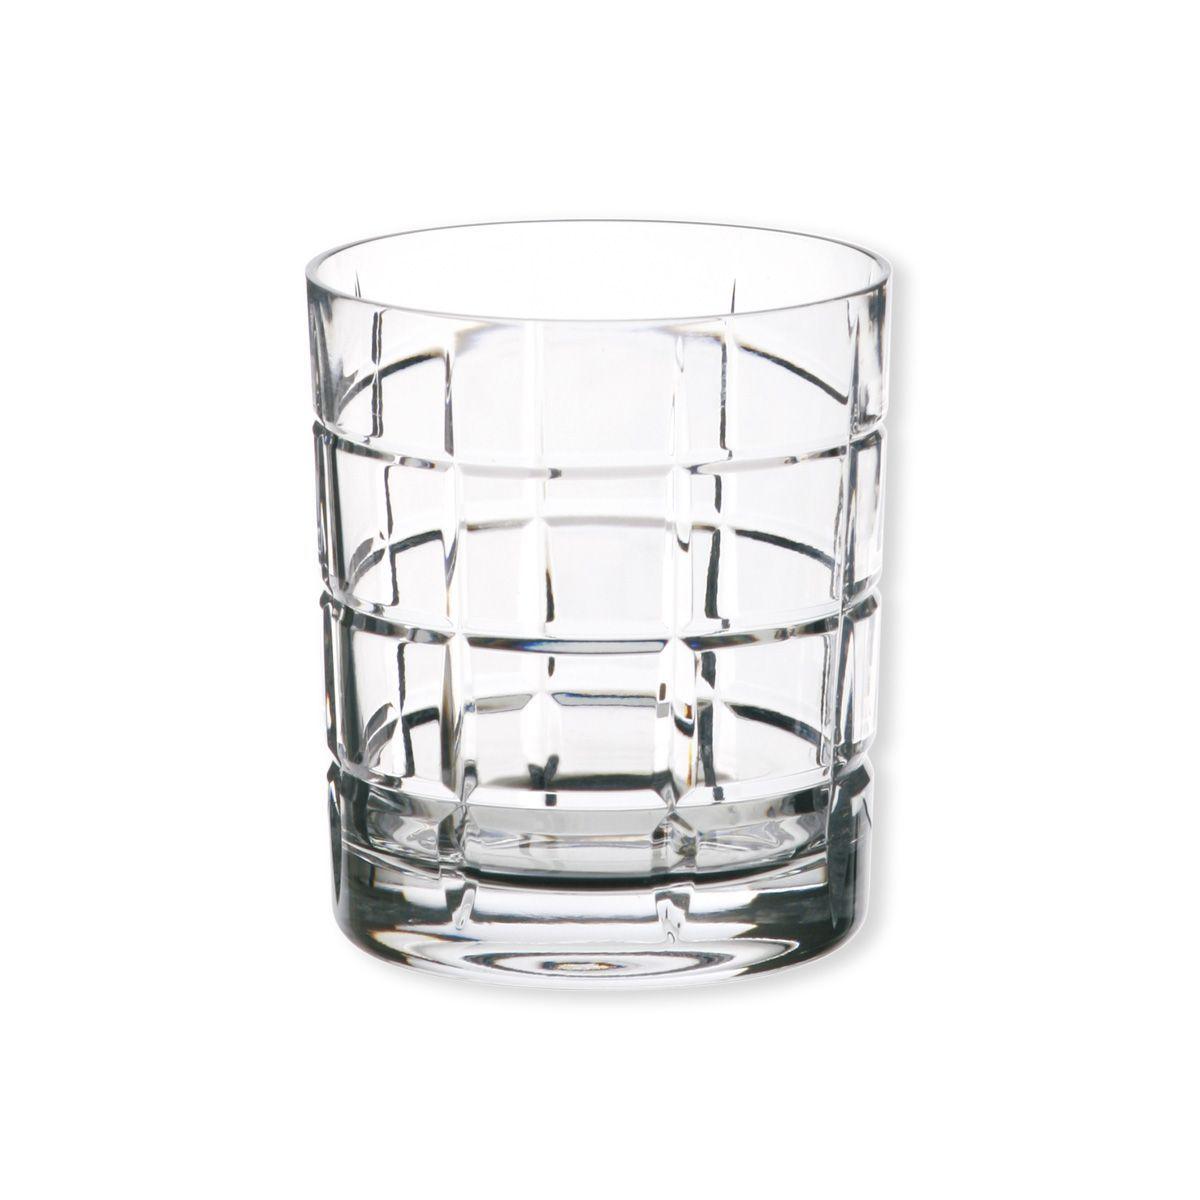 Gobelet whisky timesquare bruno evrard cr ation - Carafe a whisky maison du monde ...